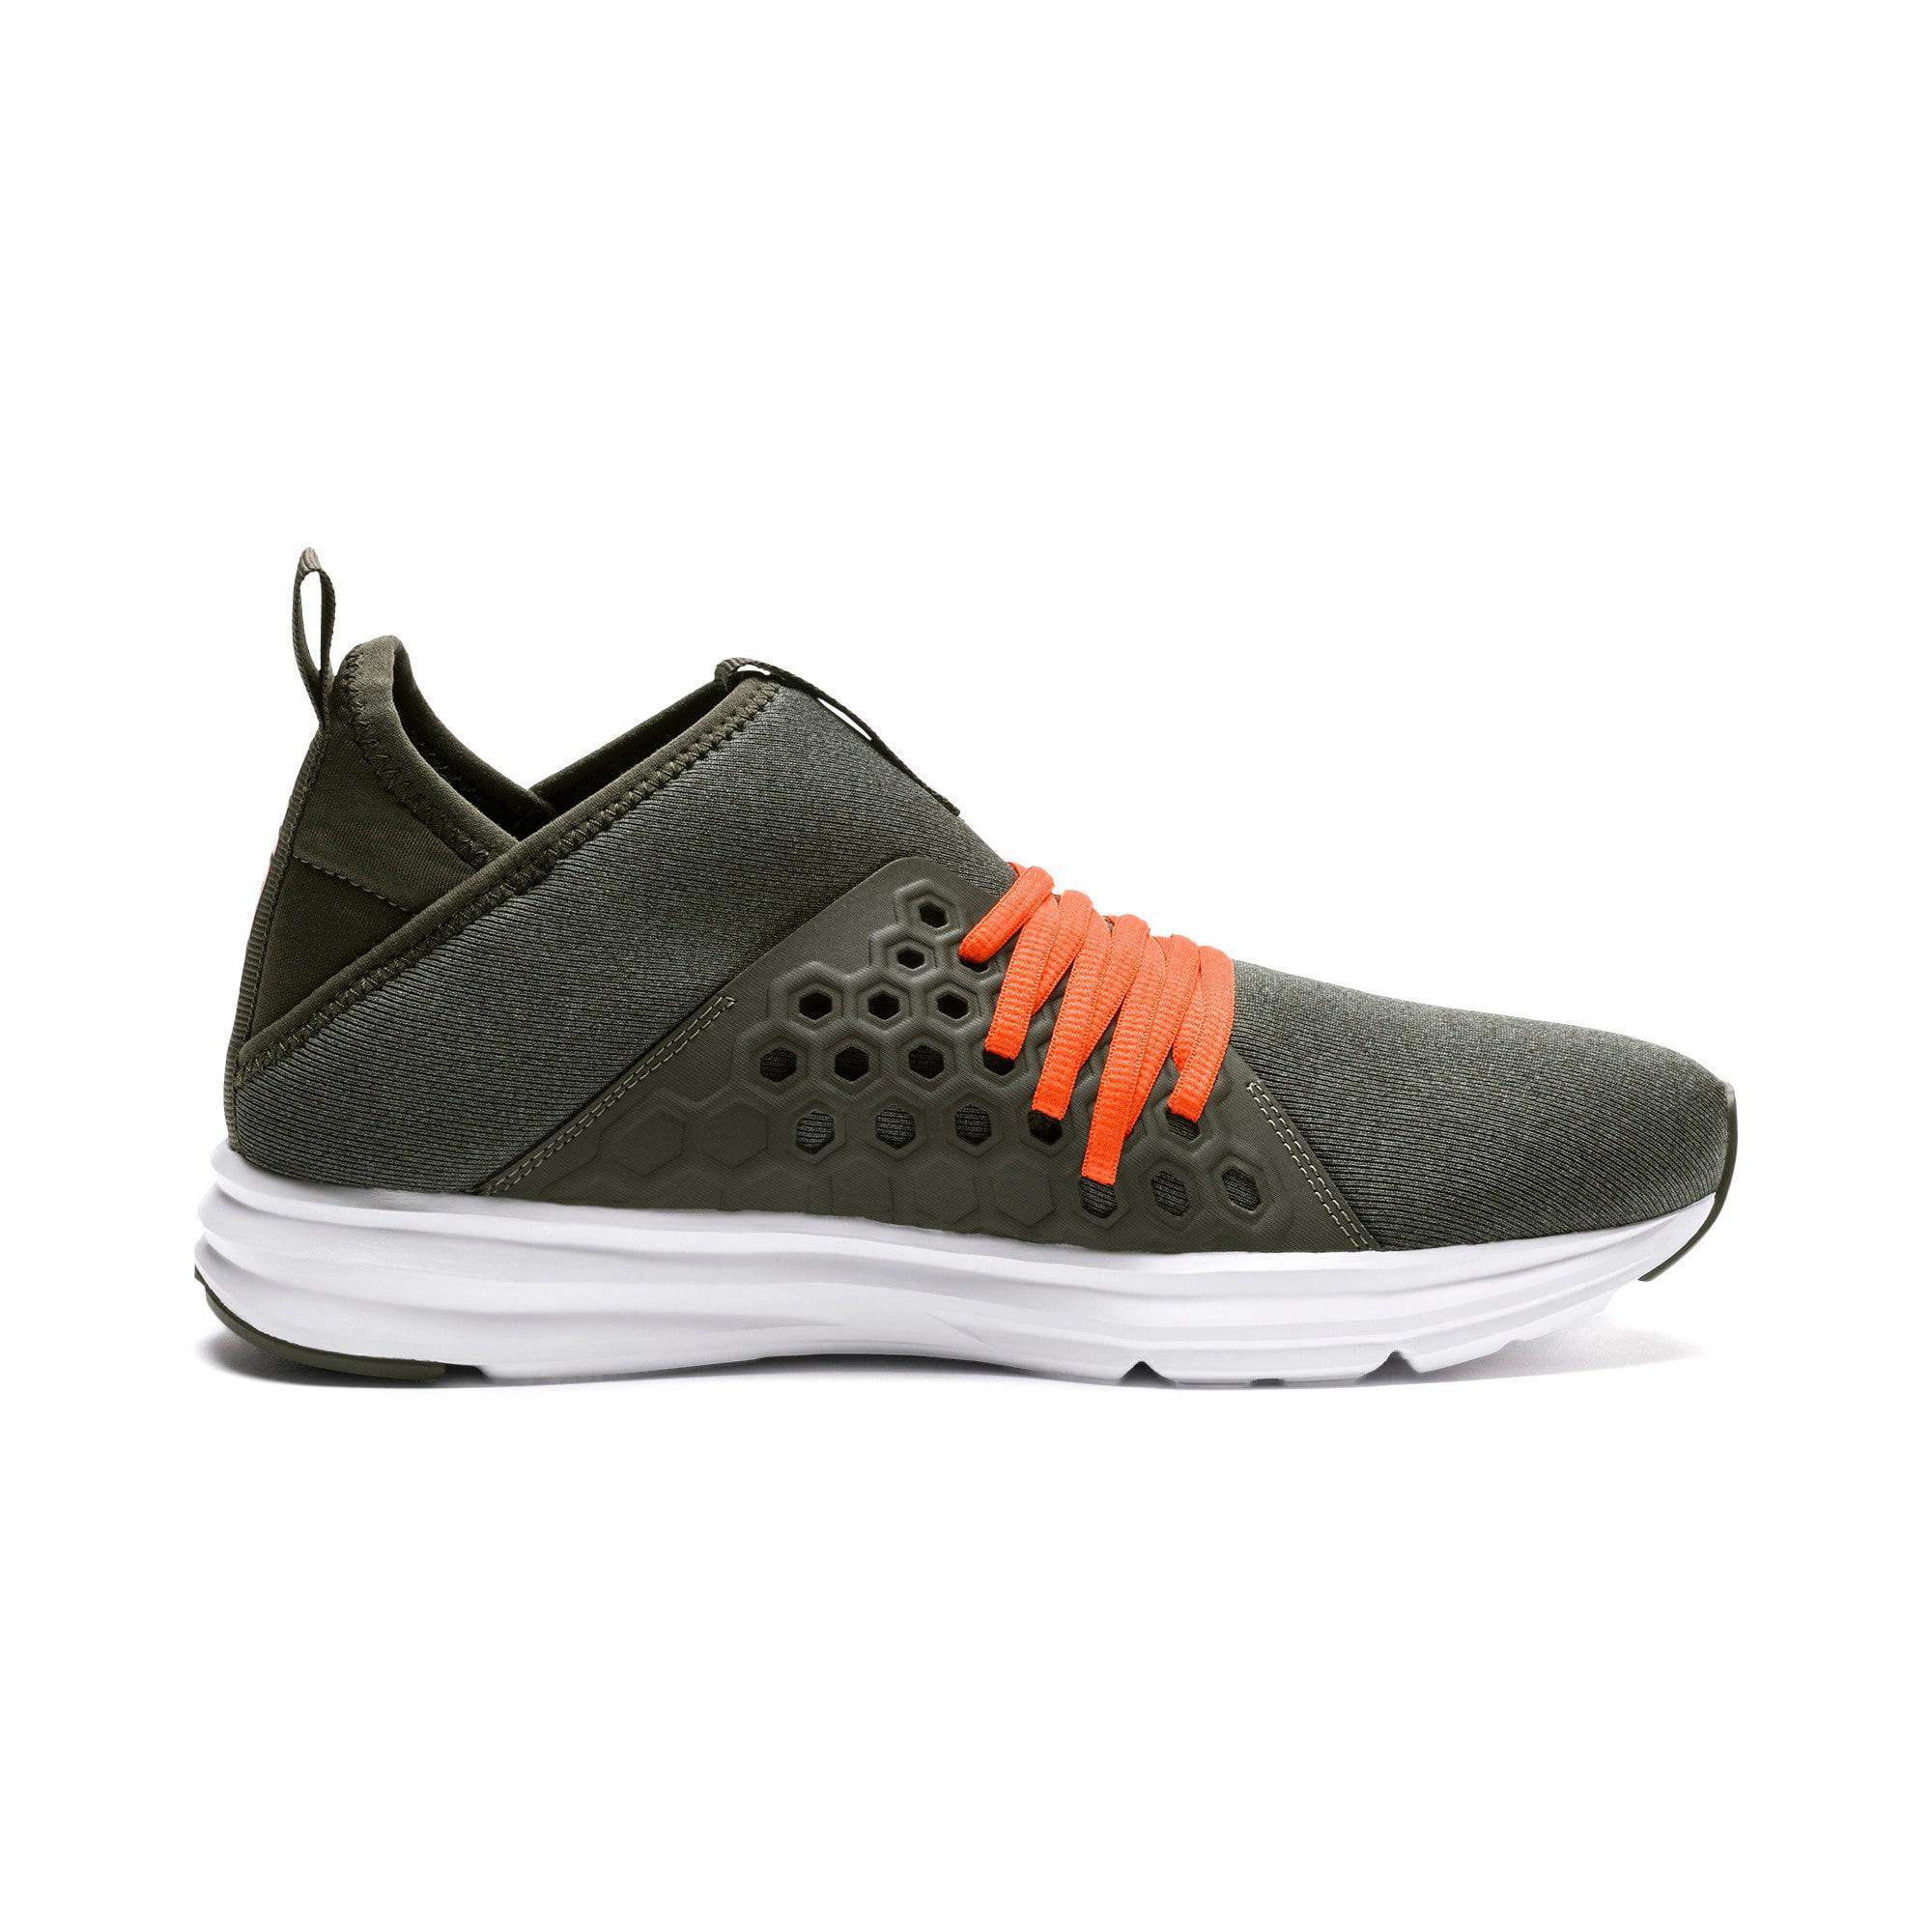 Thumbnail 5 of Enzo NETFIT Mid Men's Training Shoes, Forest Night-Firecracker, medium-IND